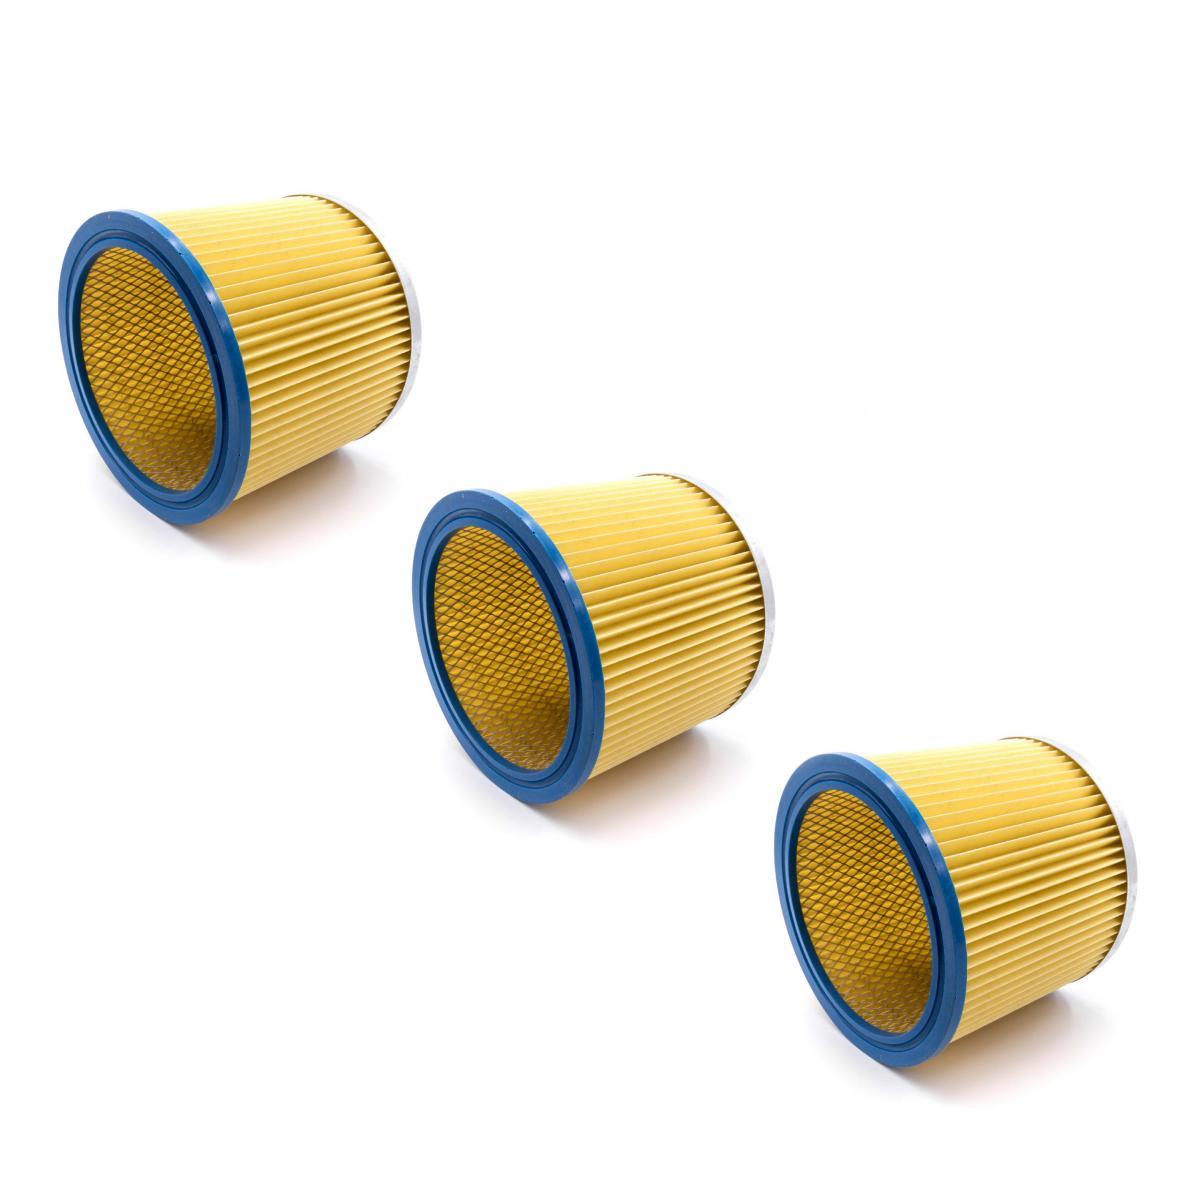 Vhbw vhbw 3x Filtre rond / filtre en lamelles pour aspirateur Shop-Vac Super 615 S2, Super 760, Ultra 40 Blower